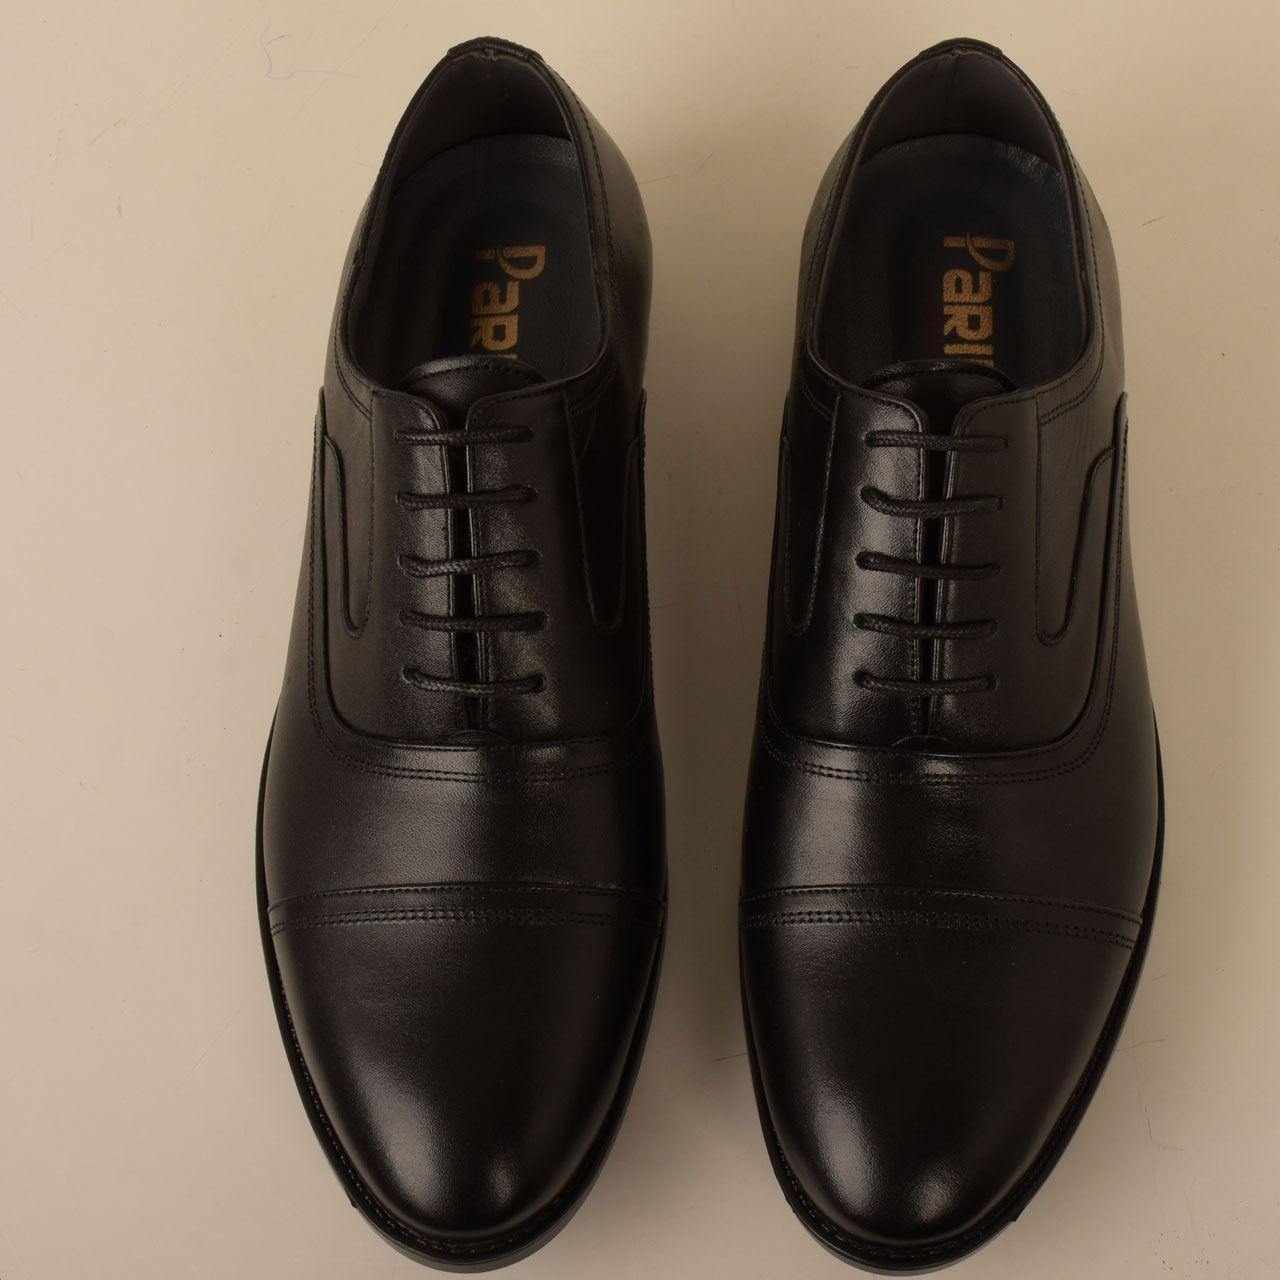 کفش مردانه پارینه چرم مدل SHO178 -  - 7